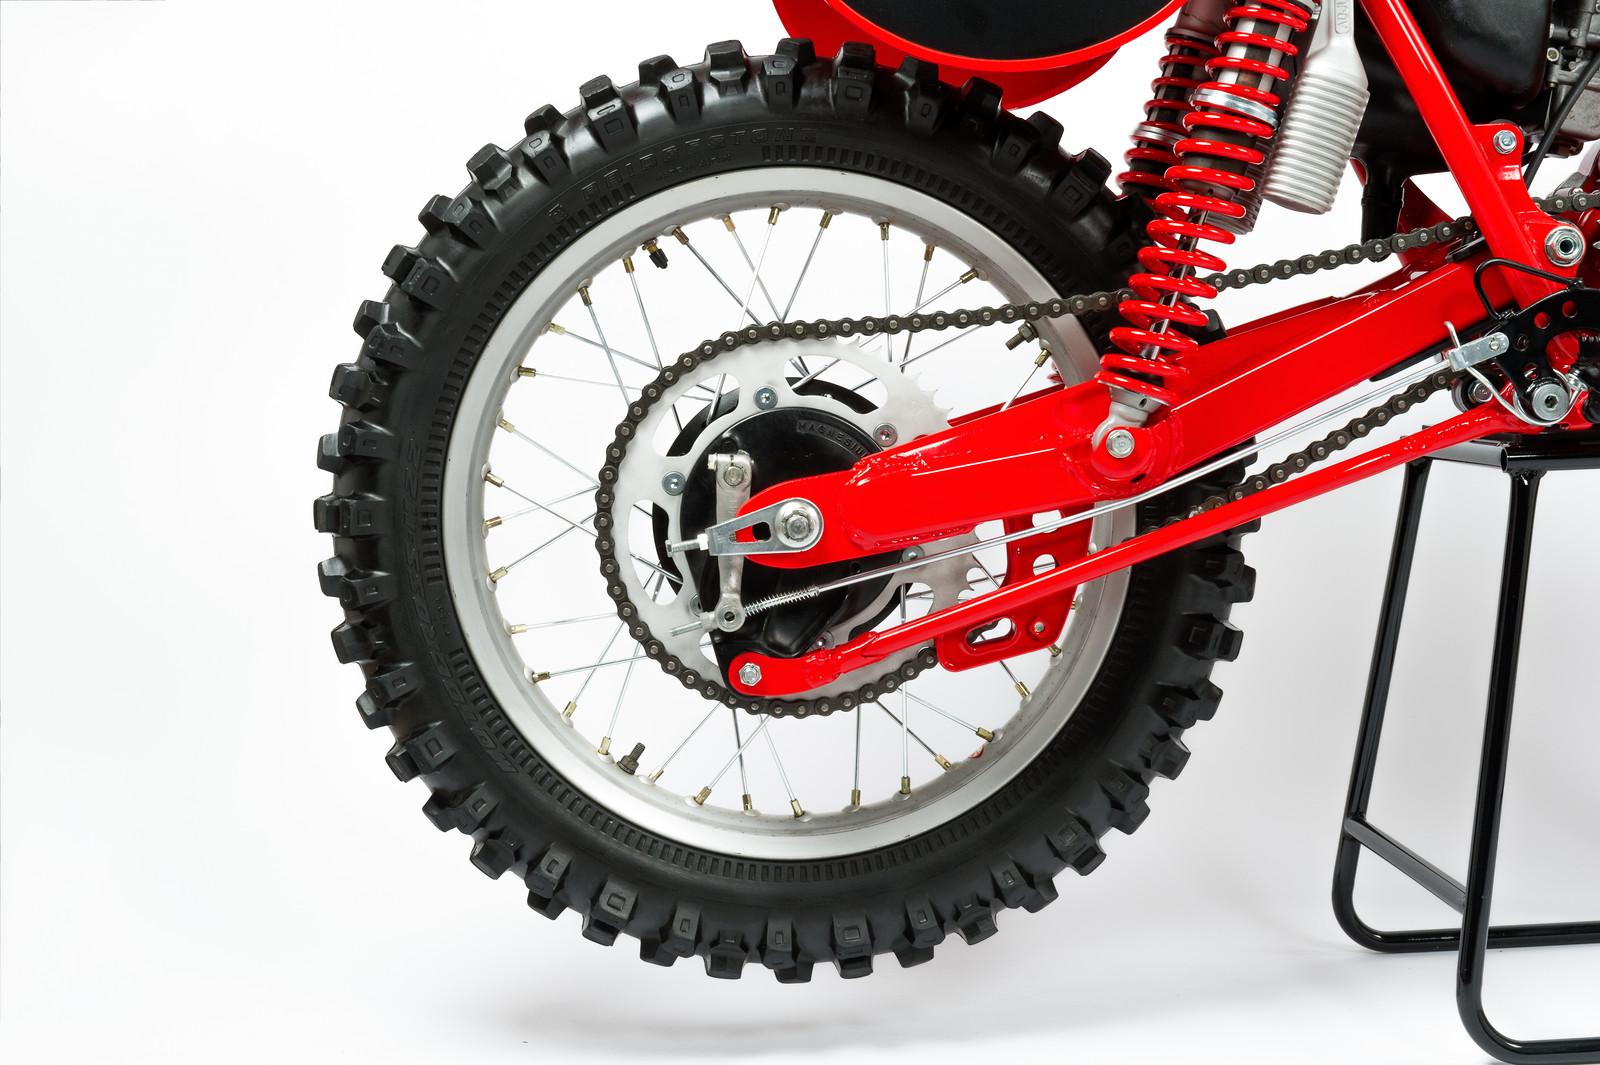 1980 Honda Cr125r Elsinore Vintagehondanls Bike Check Vital Mx Dirt 125 Related